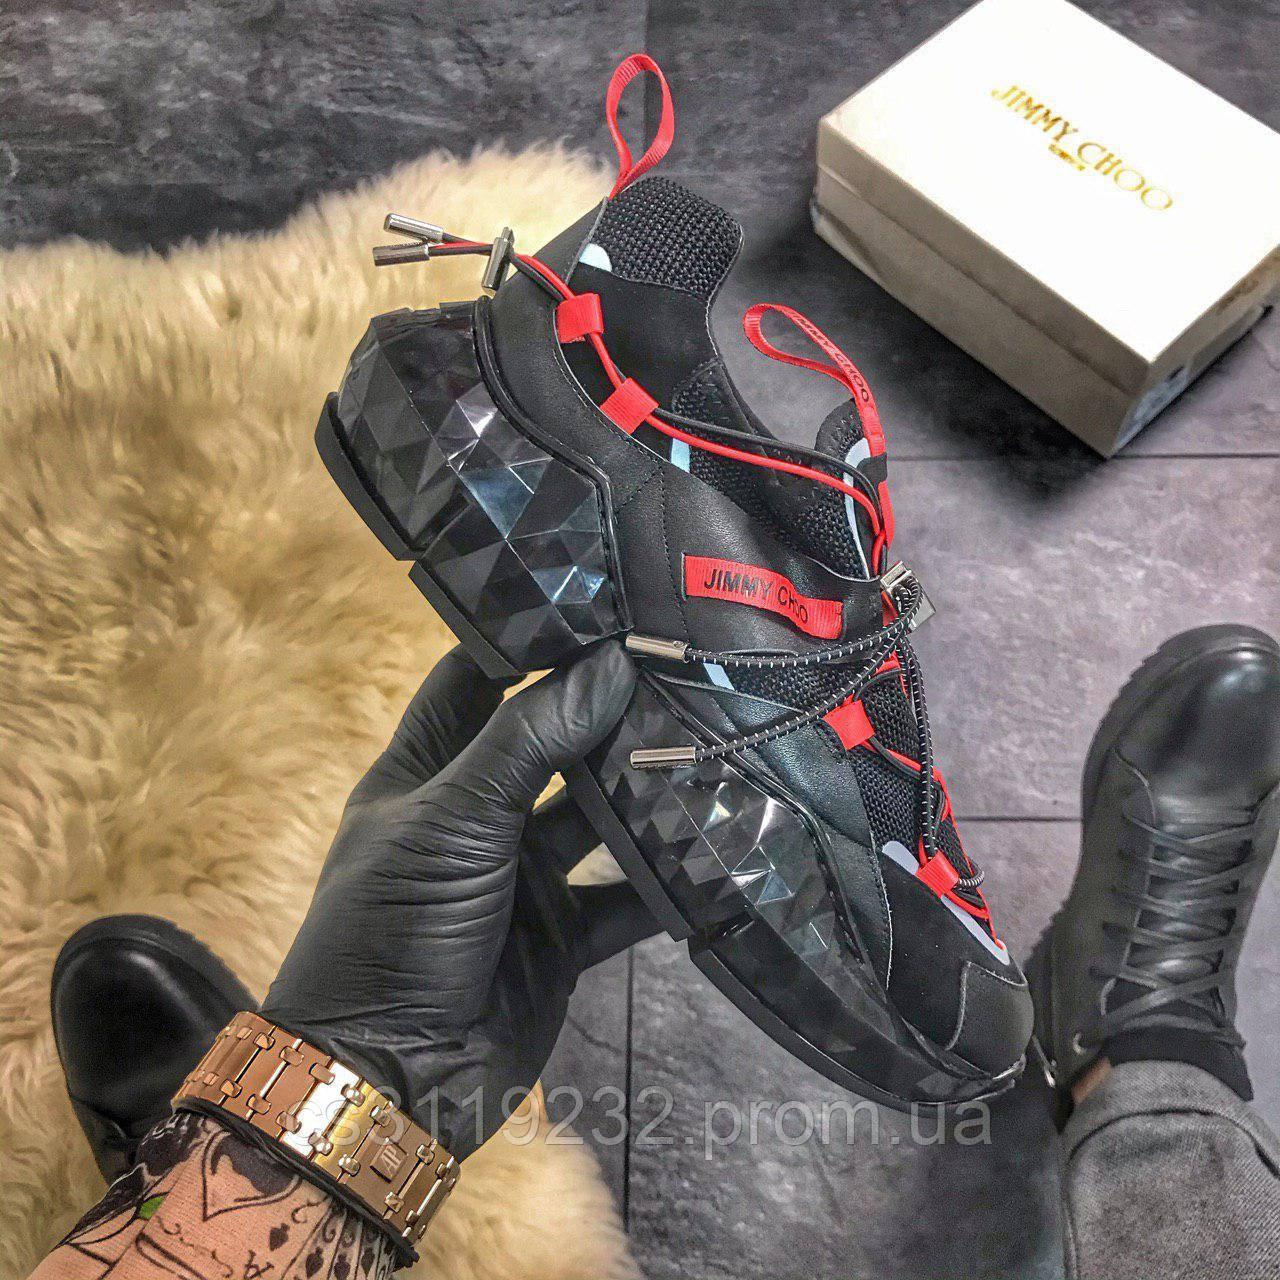 Женские кроссовки Jimmy Choo Black Red размер 39